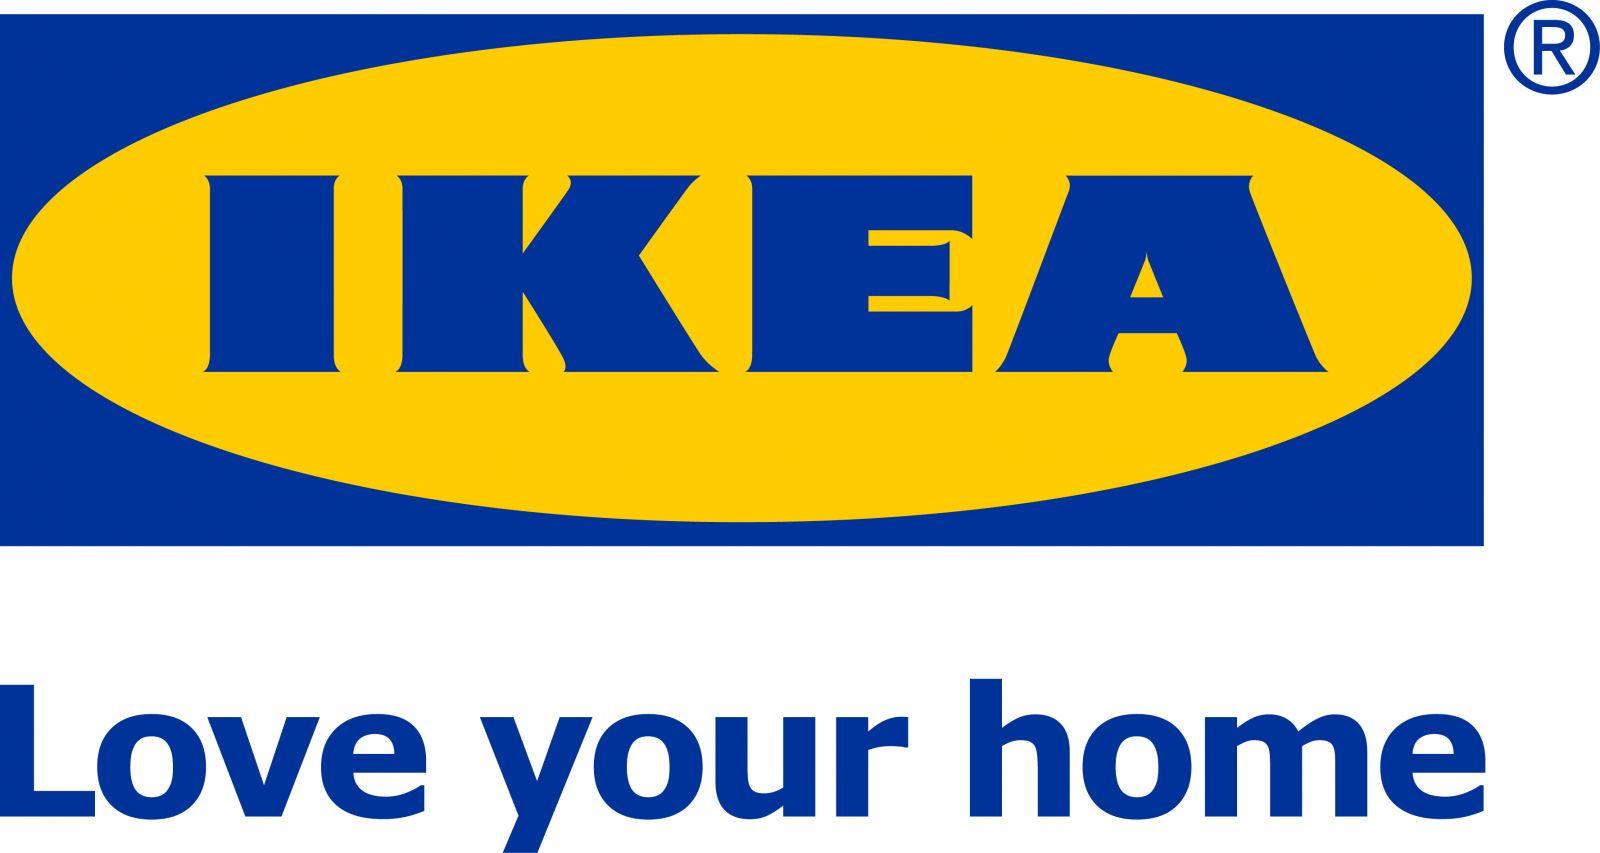 Ikea Logo Eps PNG Transparent Ikea Logo Eps.PNG Images.